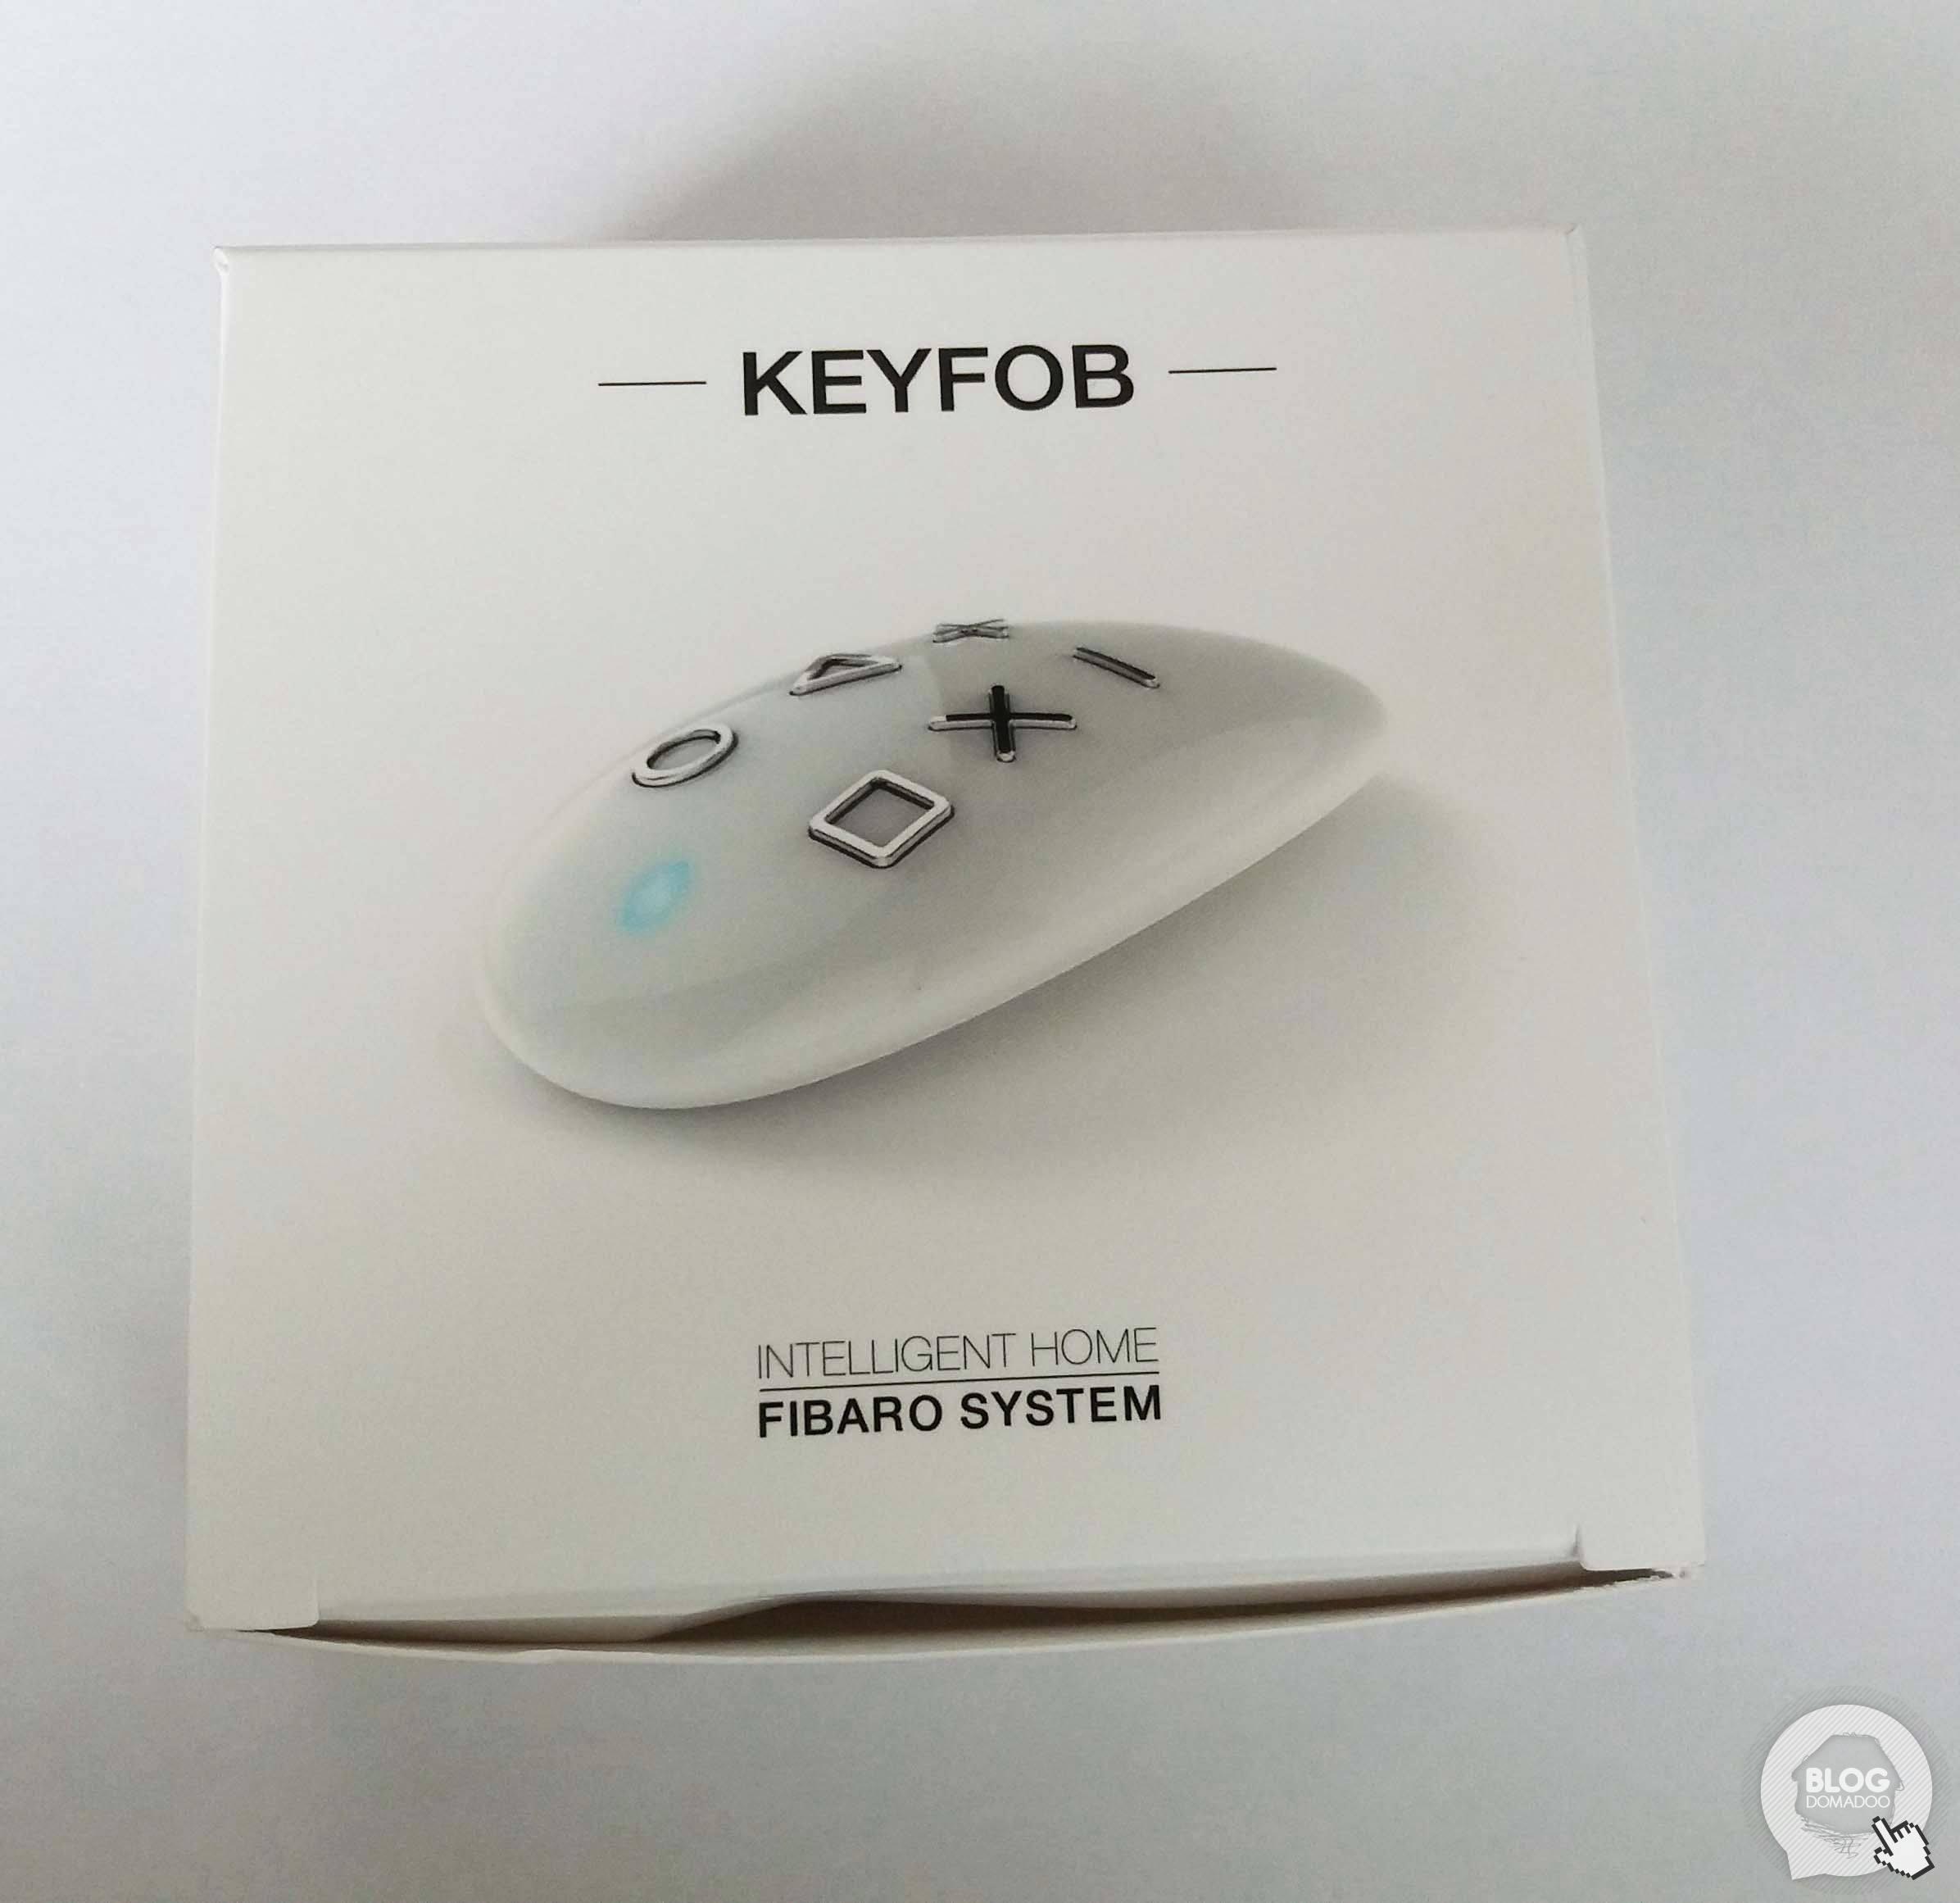 Keyfob avec Eedomus01